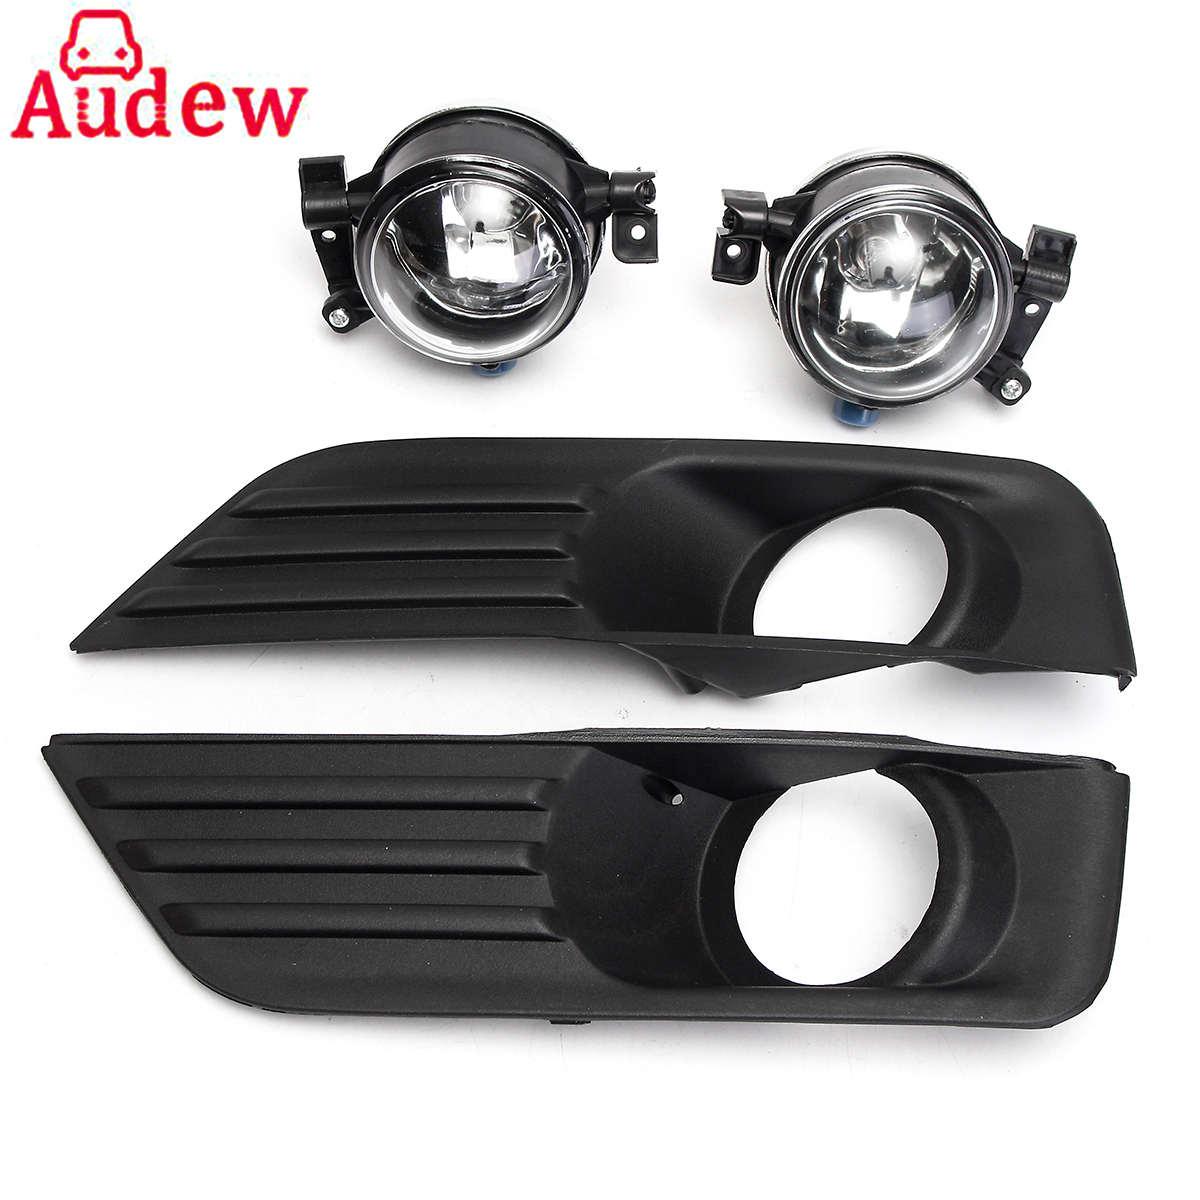 2Pcs Car Bumper Front  Fog Lights Lamp Day Running Light Cover Grille Kit Set For Ford/Focus 2005-2007<br>